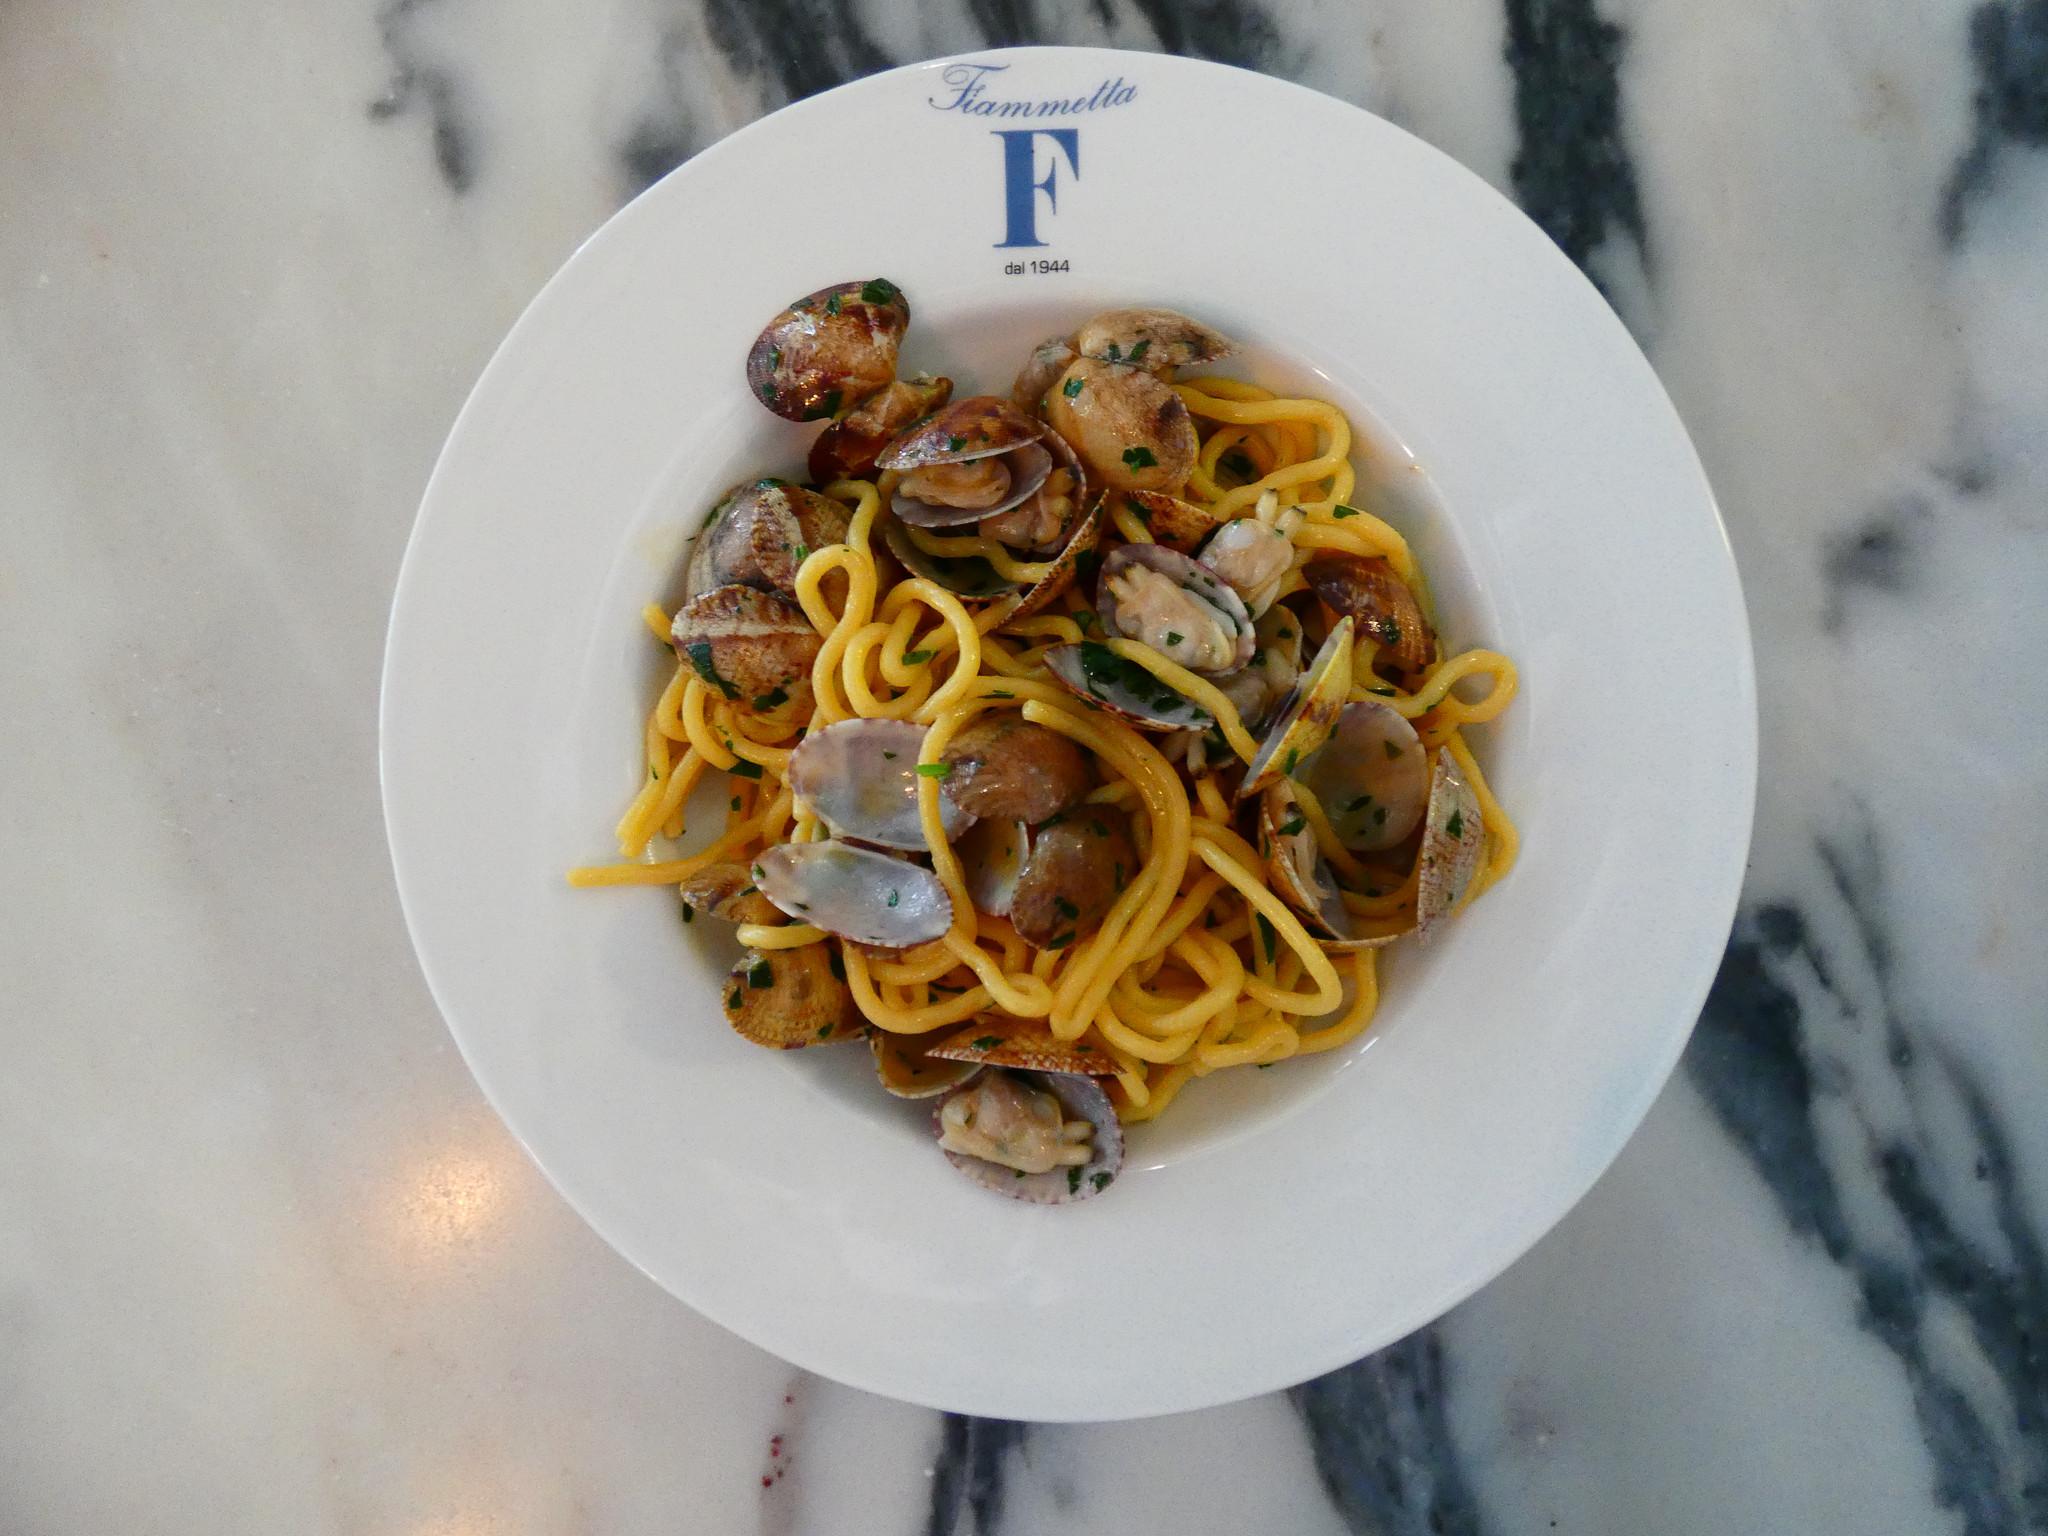 Restaurante La Fiammetta P1000165.JPG